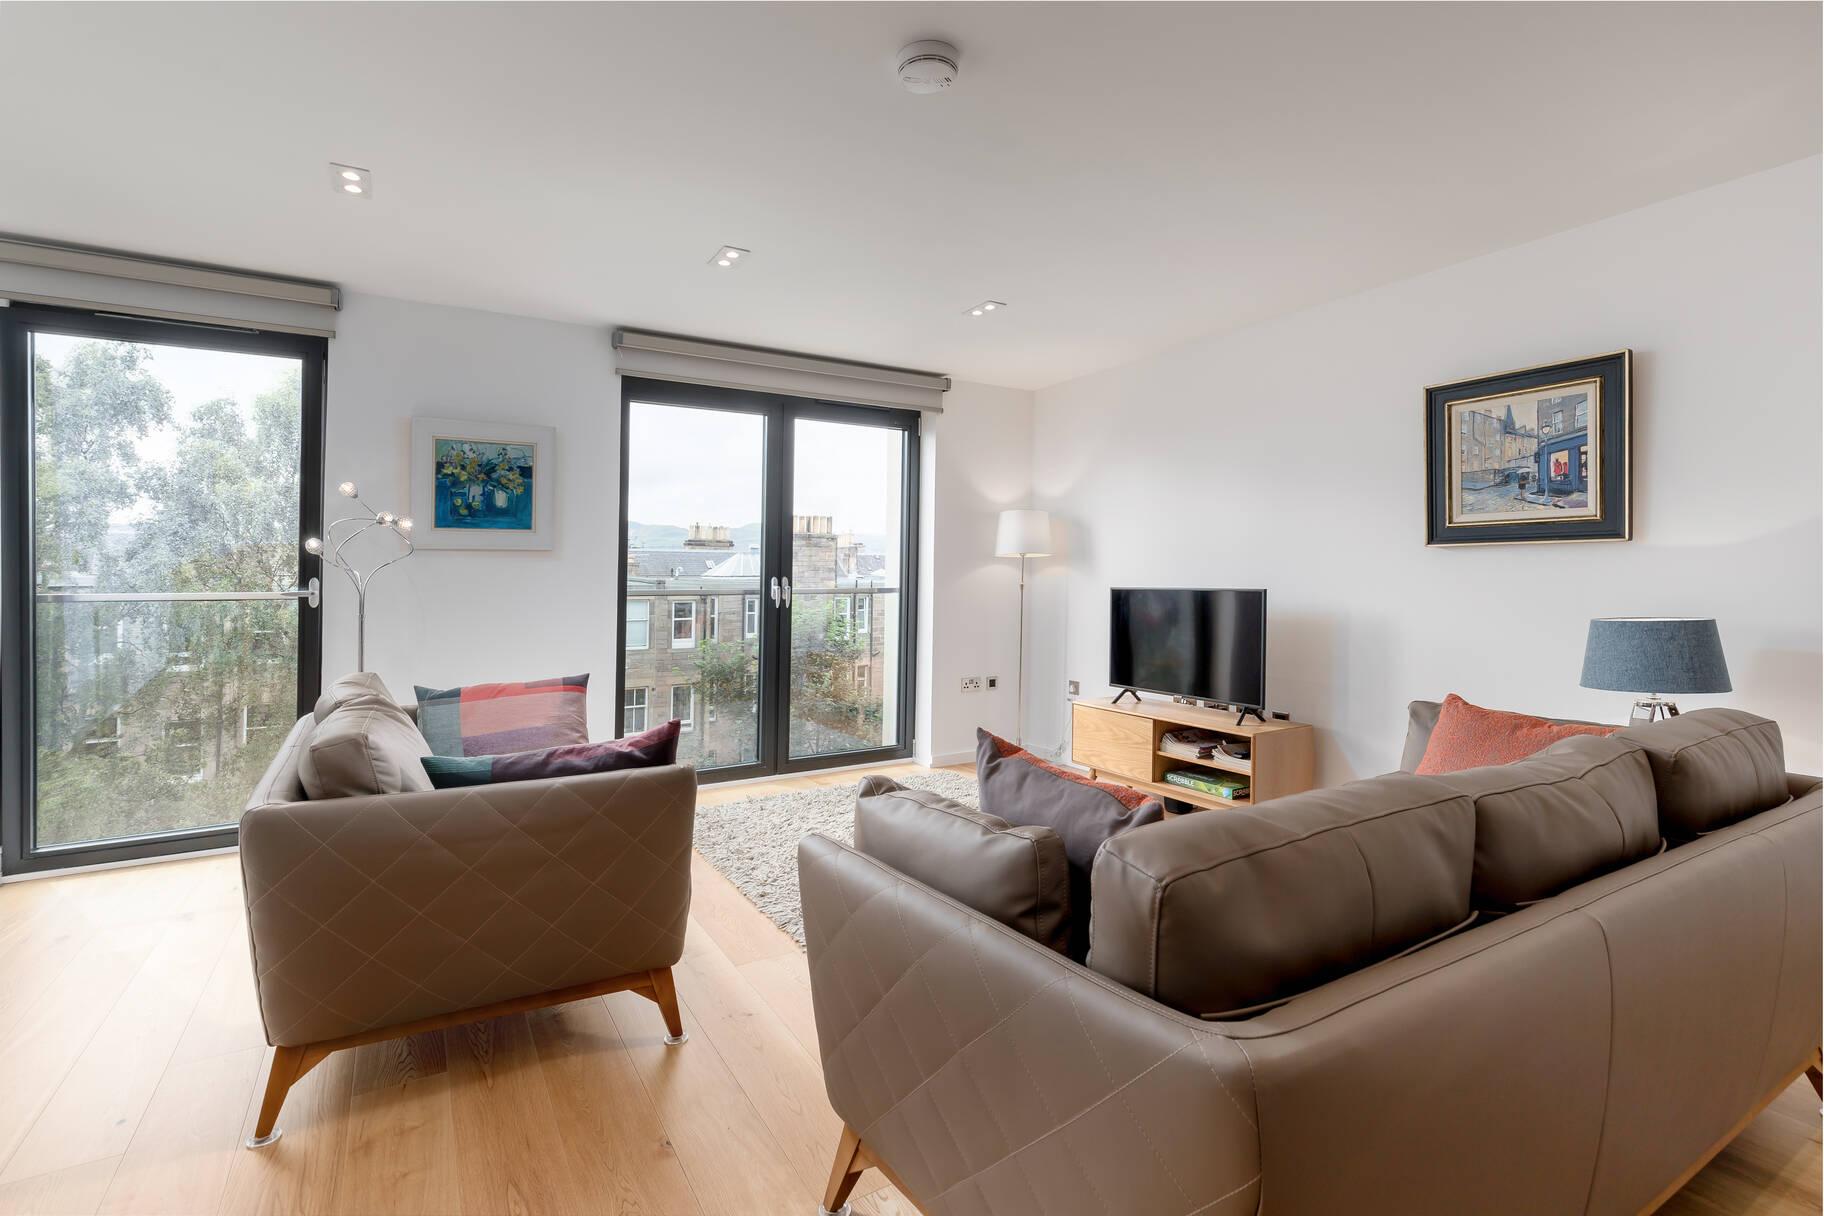 52/6 Newbattle Terrace, Morningside, Edinburgh, EH10 4RX